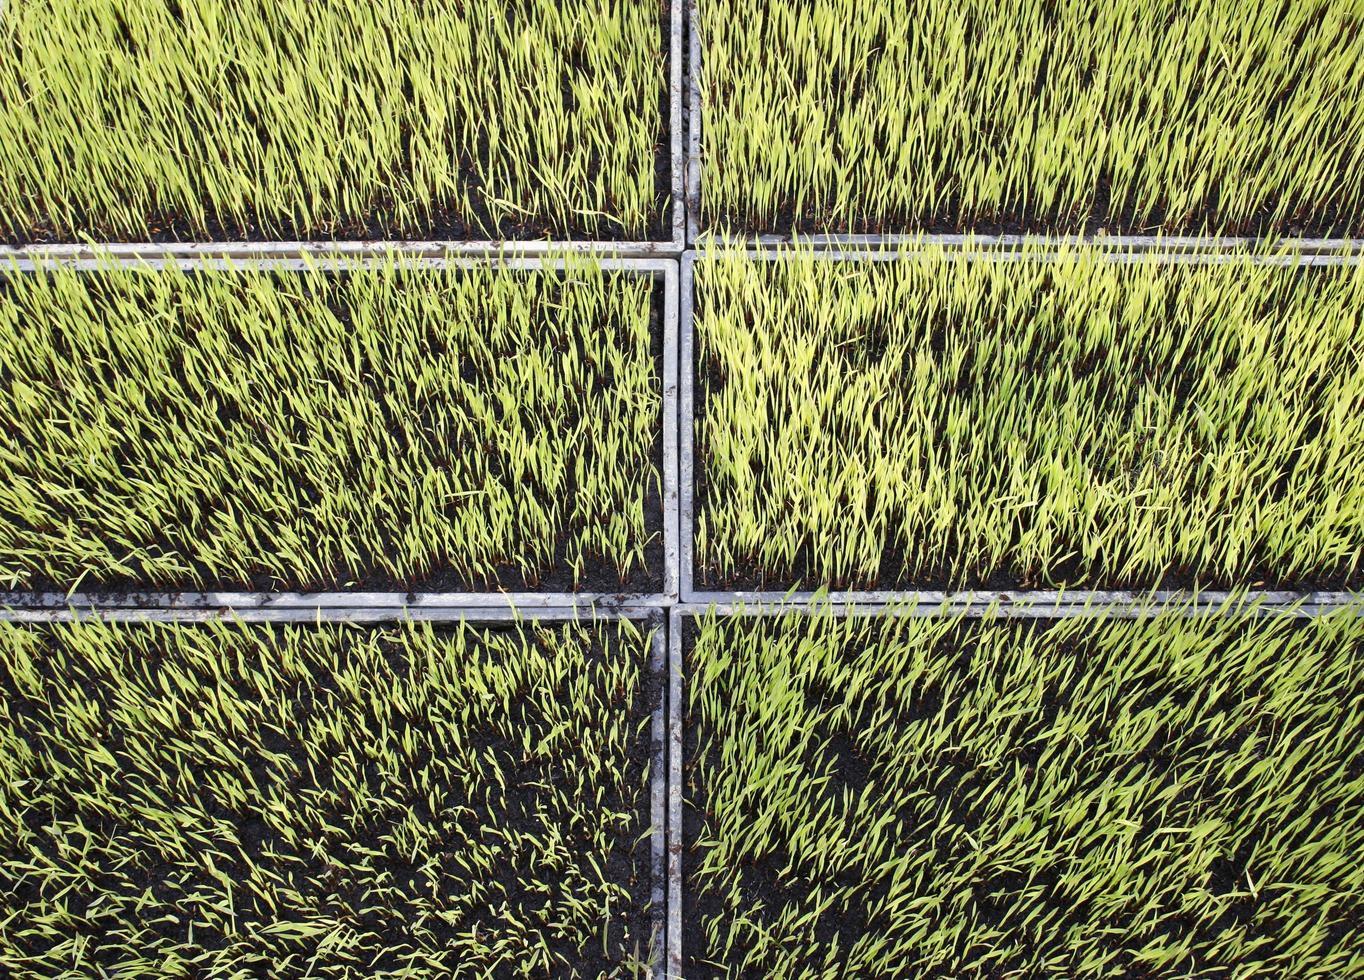 rice plant seedings farm garden photo